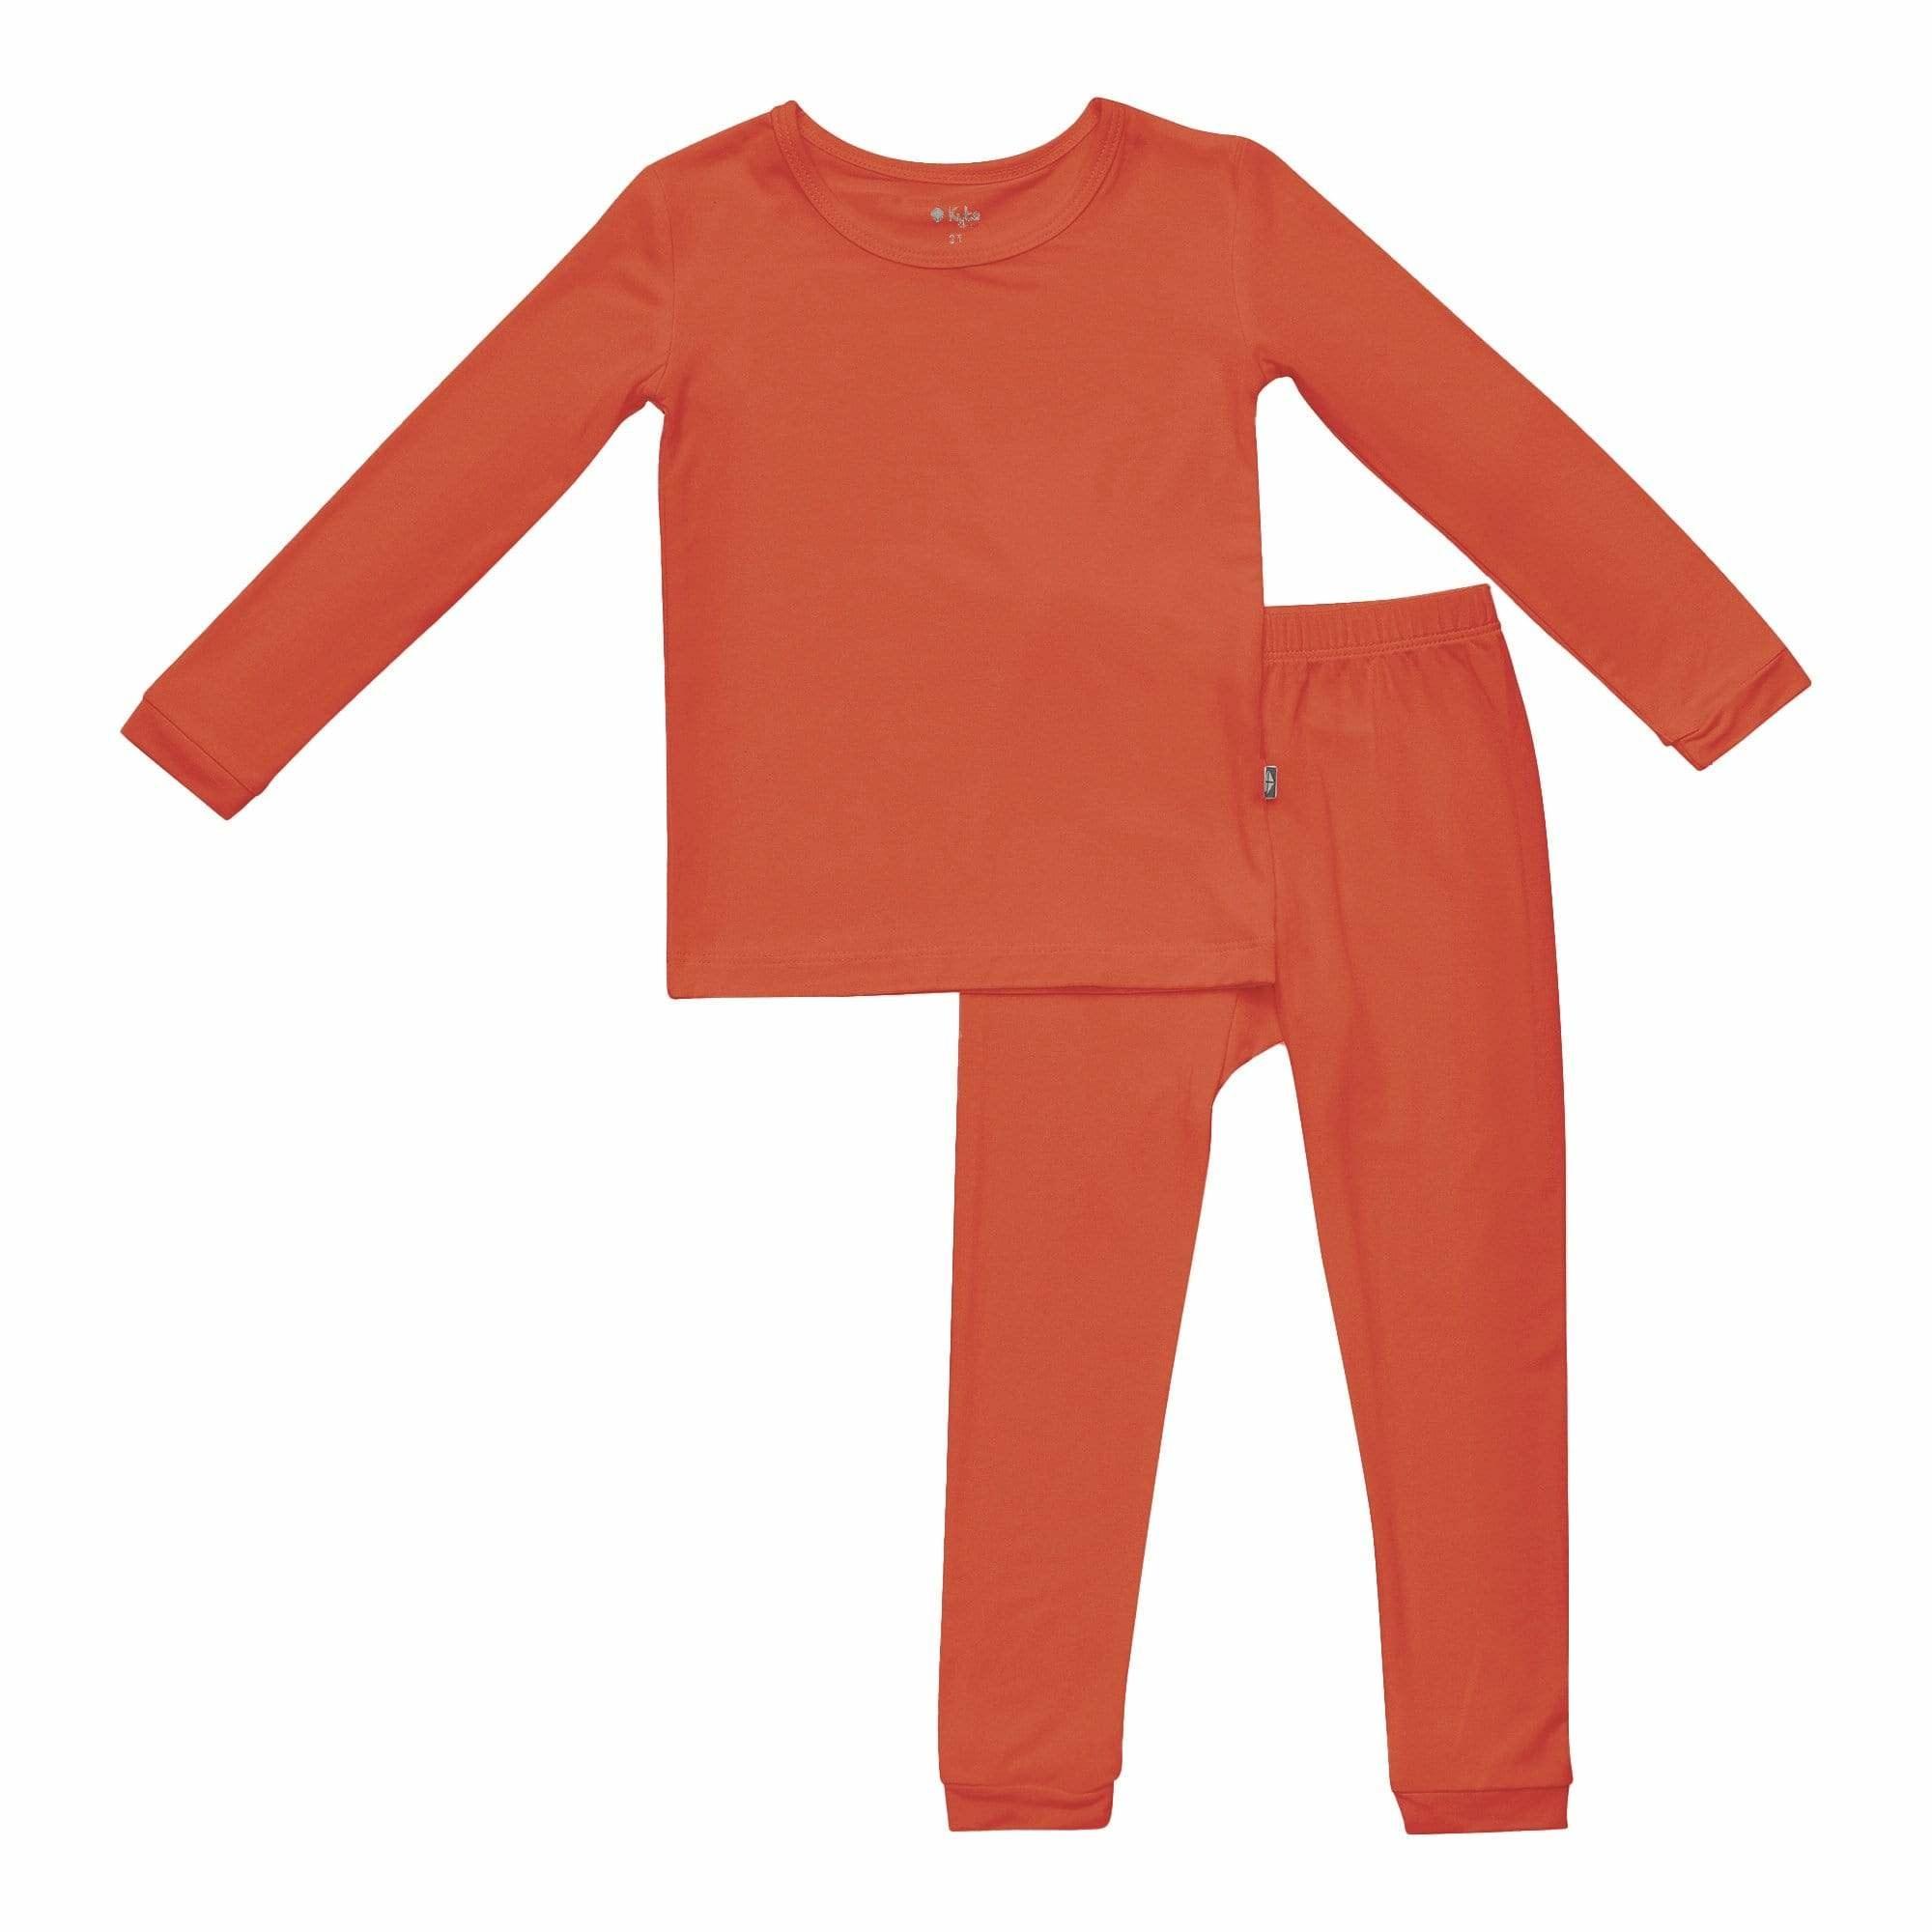 Kyte Baby Pajama Set - Clementine